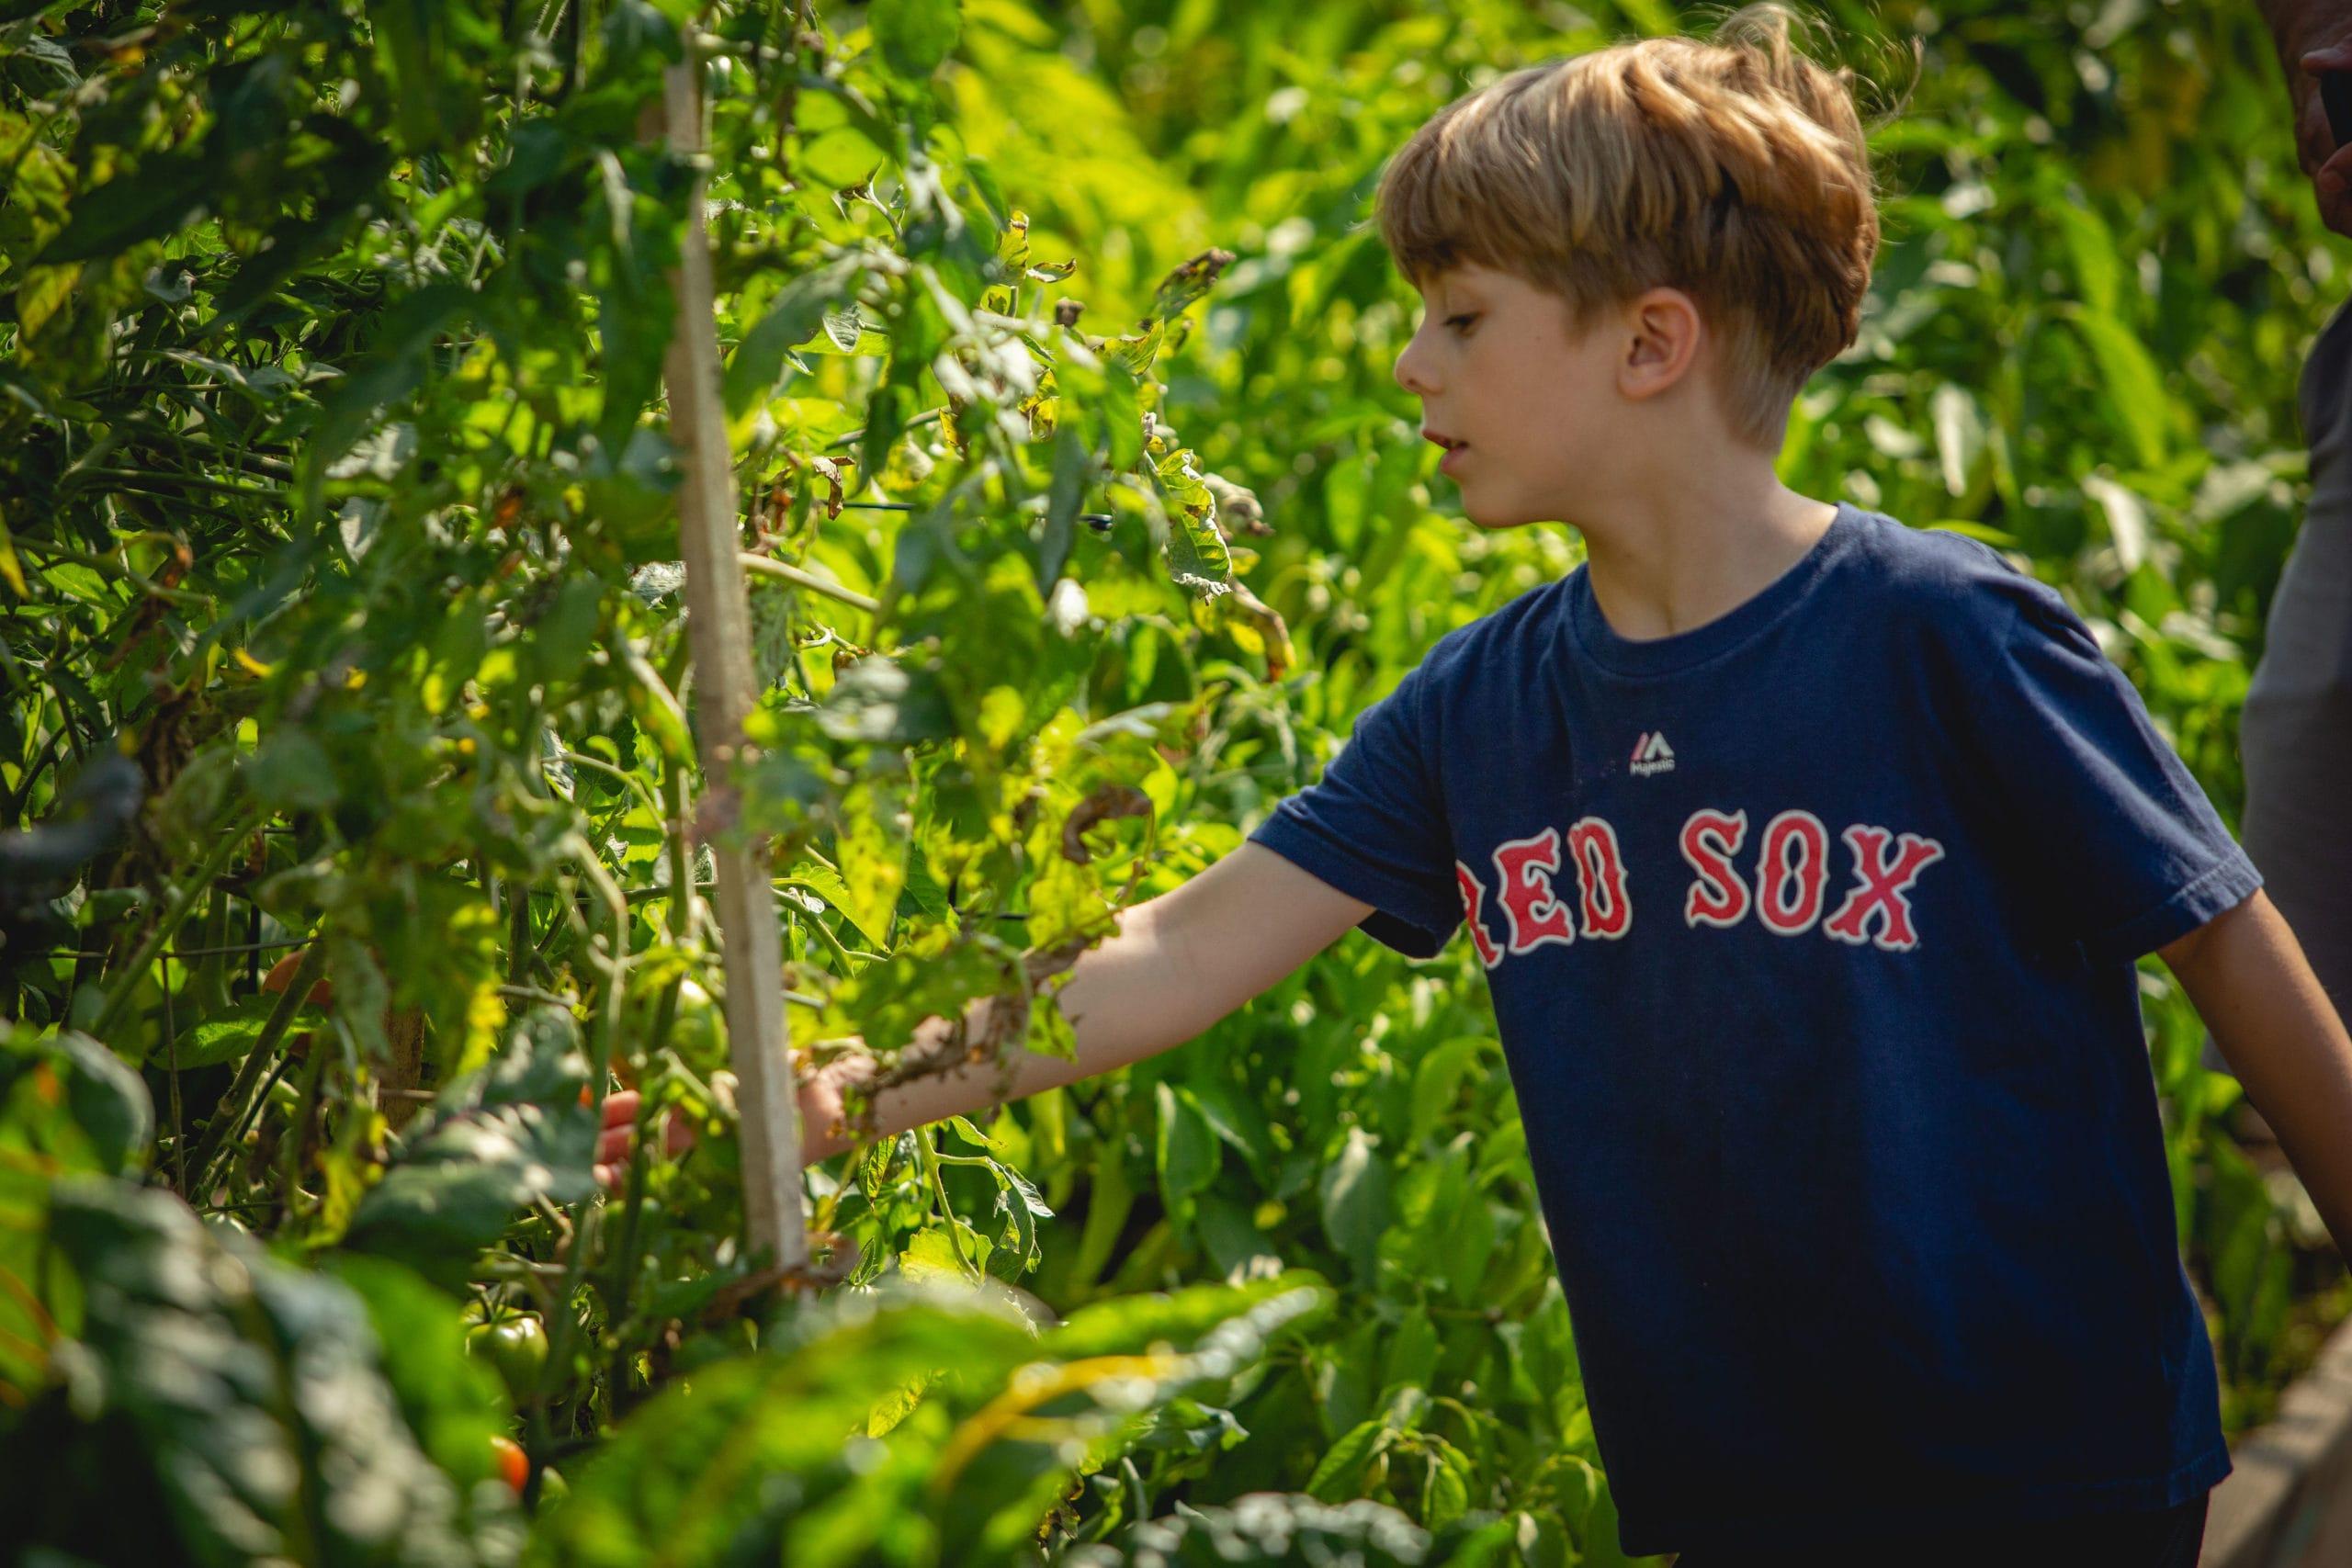 It's just not kindergarten without a garden